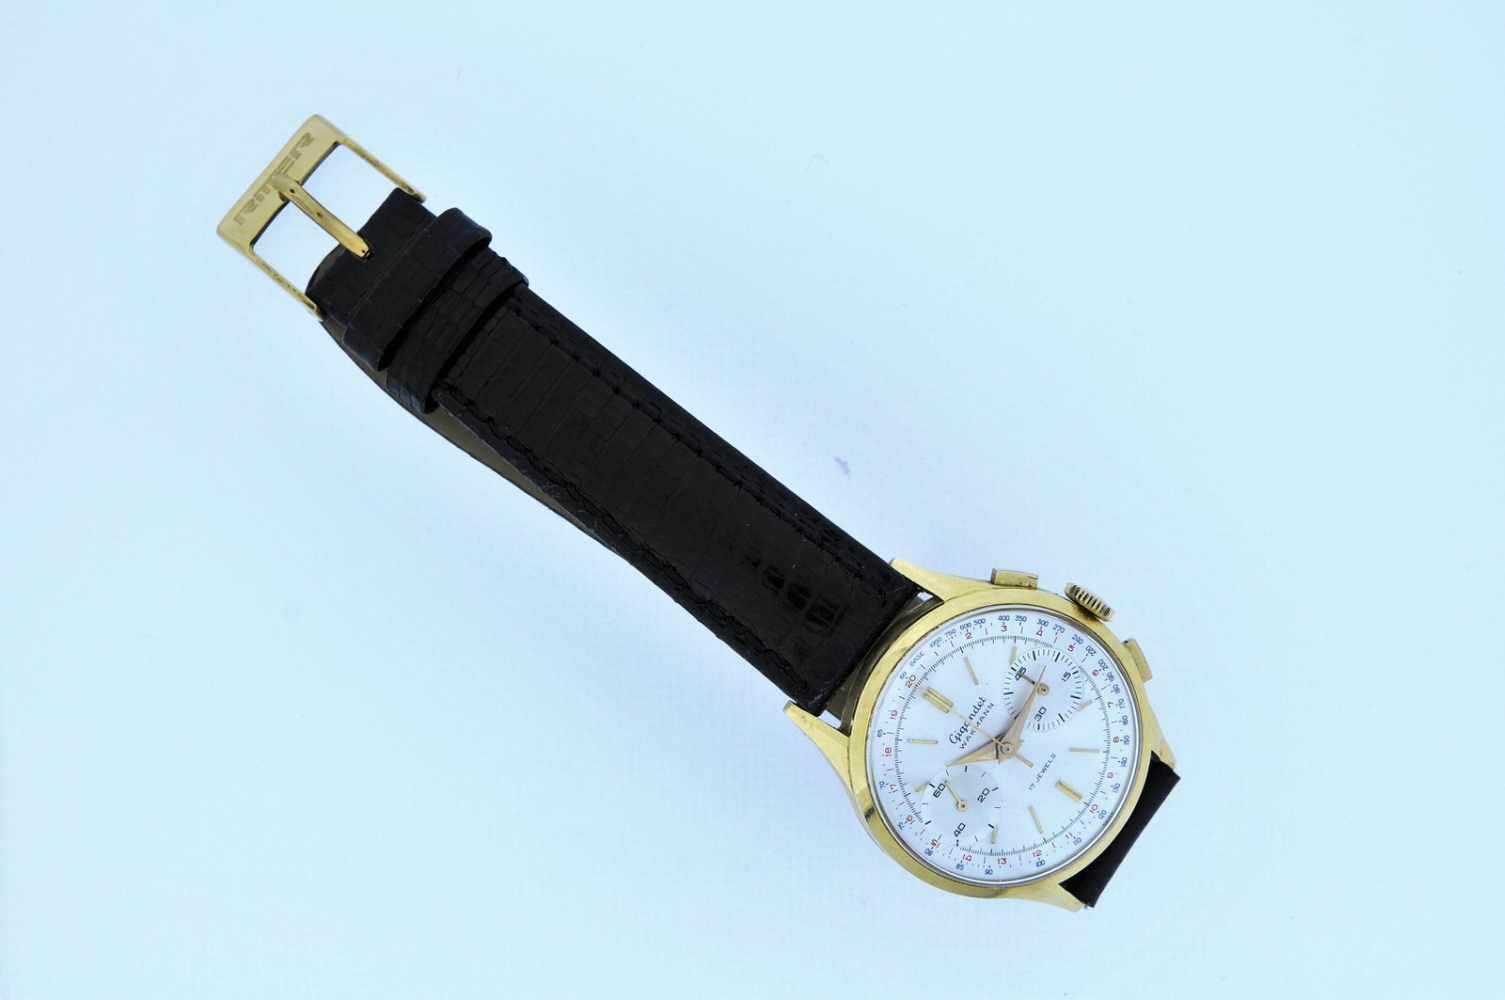 Gigandet Goldene 18karätige Armbanduhr an Lederband, Gigandet Wakmann, Chronograph, Stoppfunktion, - Bild 3 aus 5